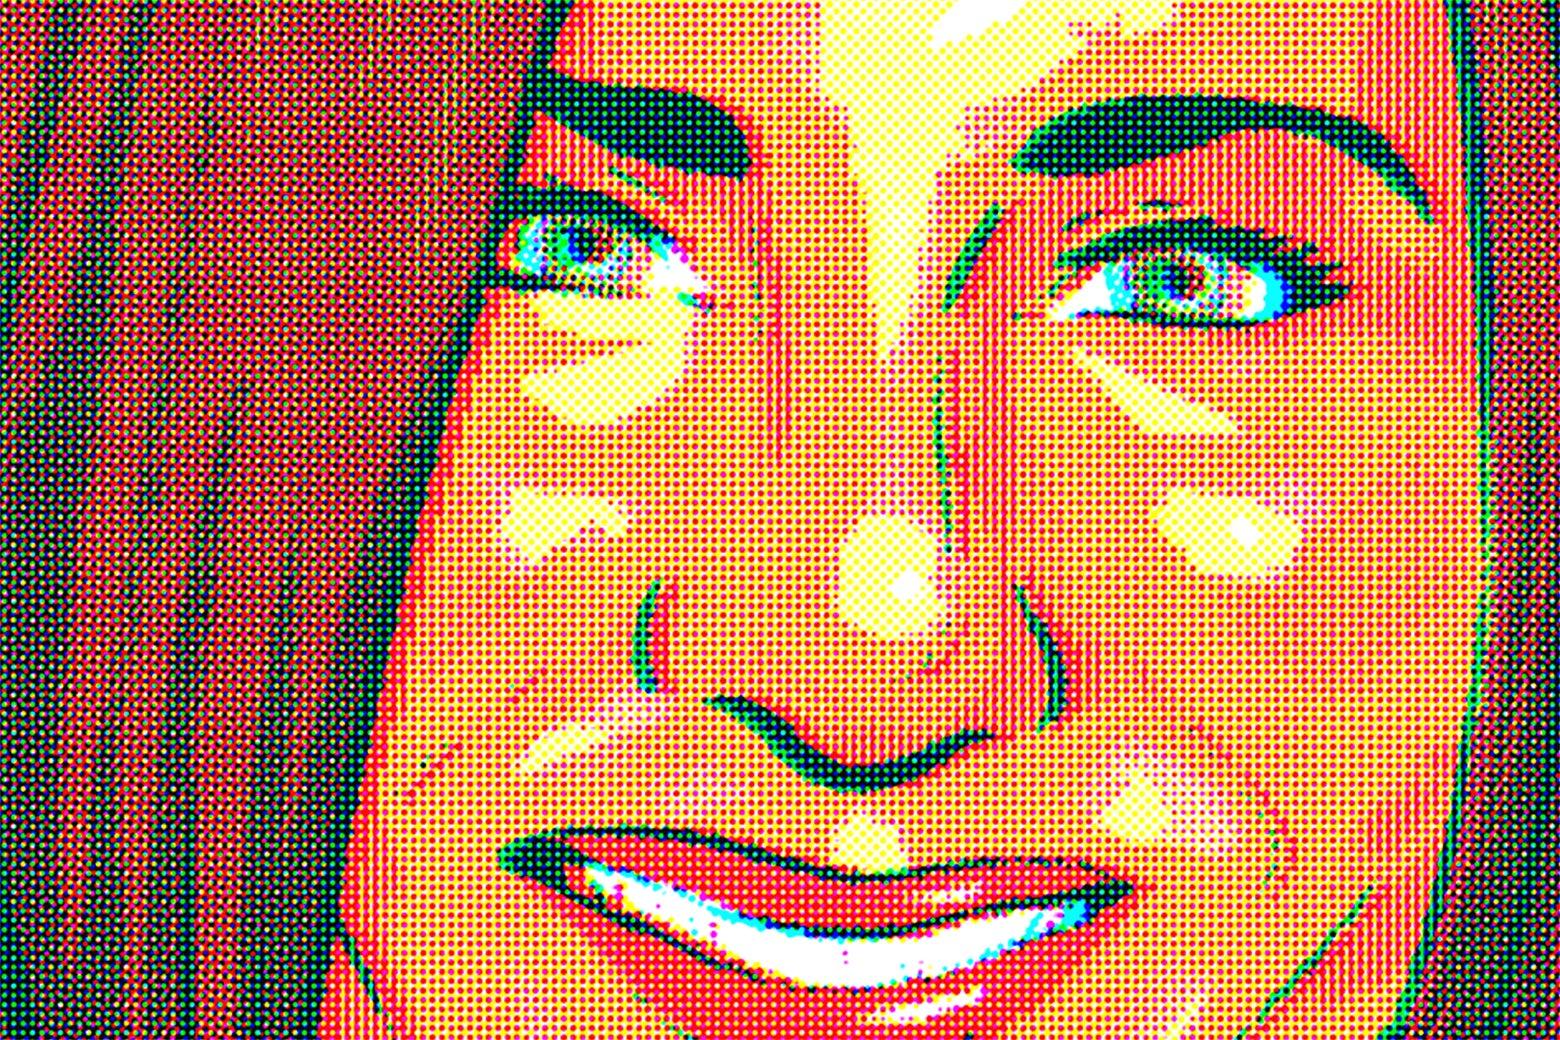 A pointillistic image of Jennifer Aniston.